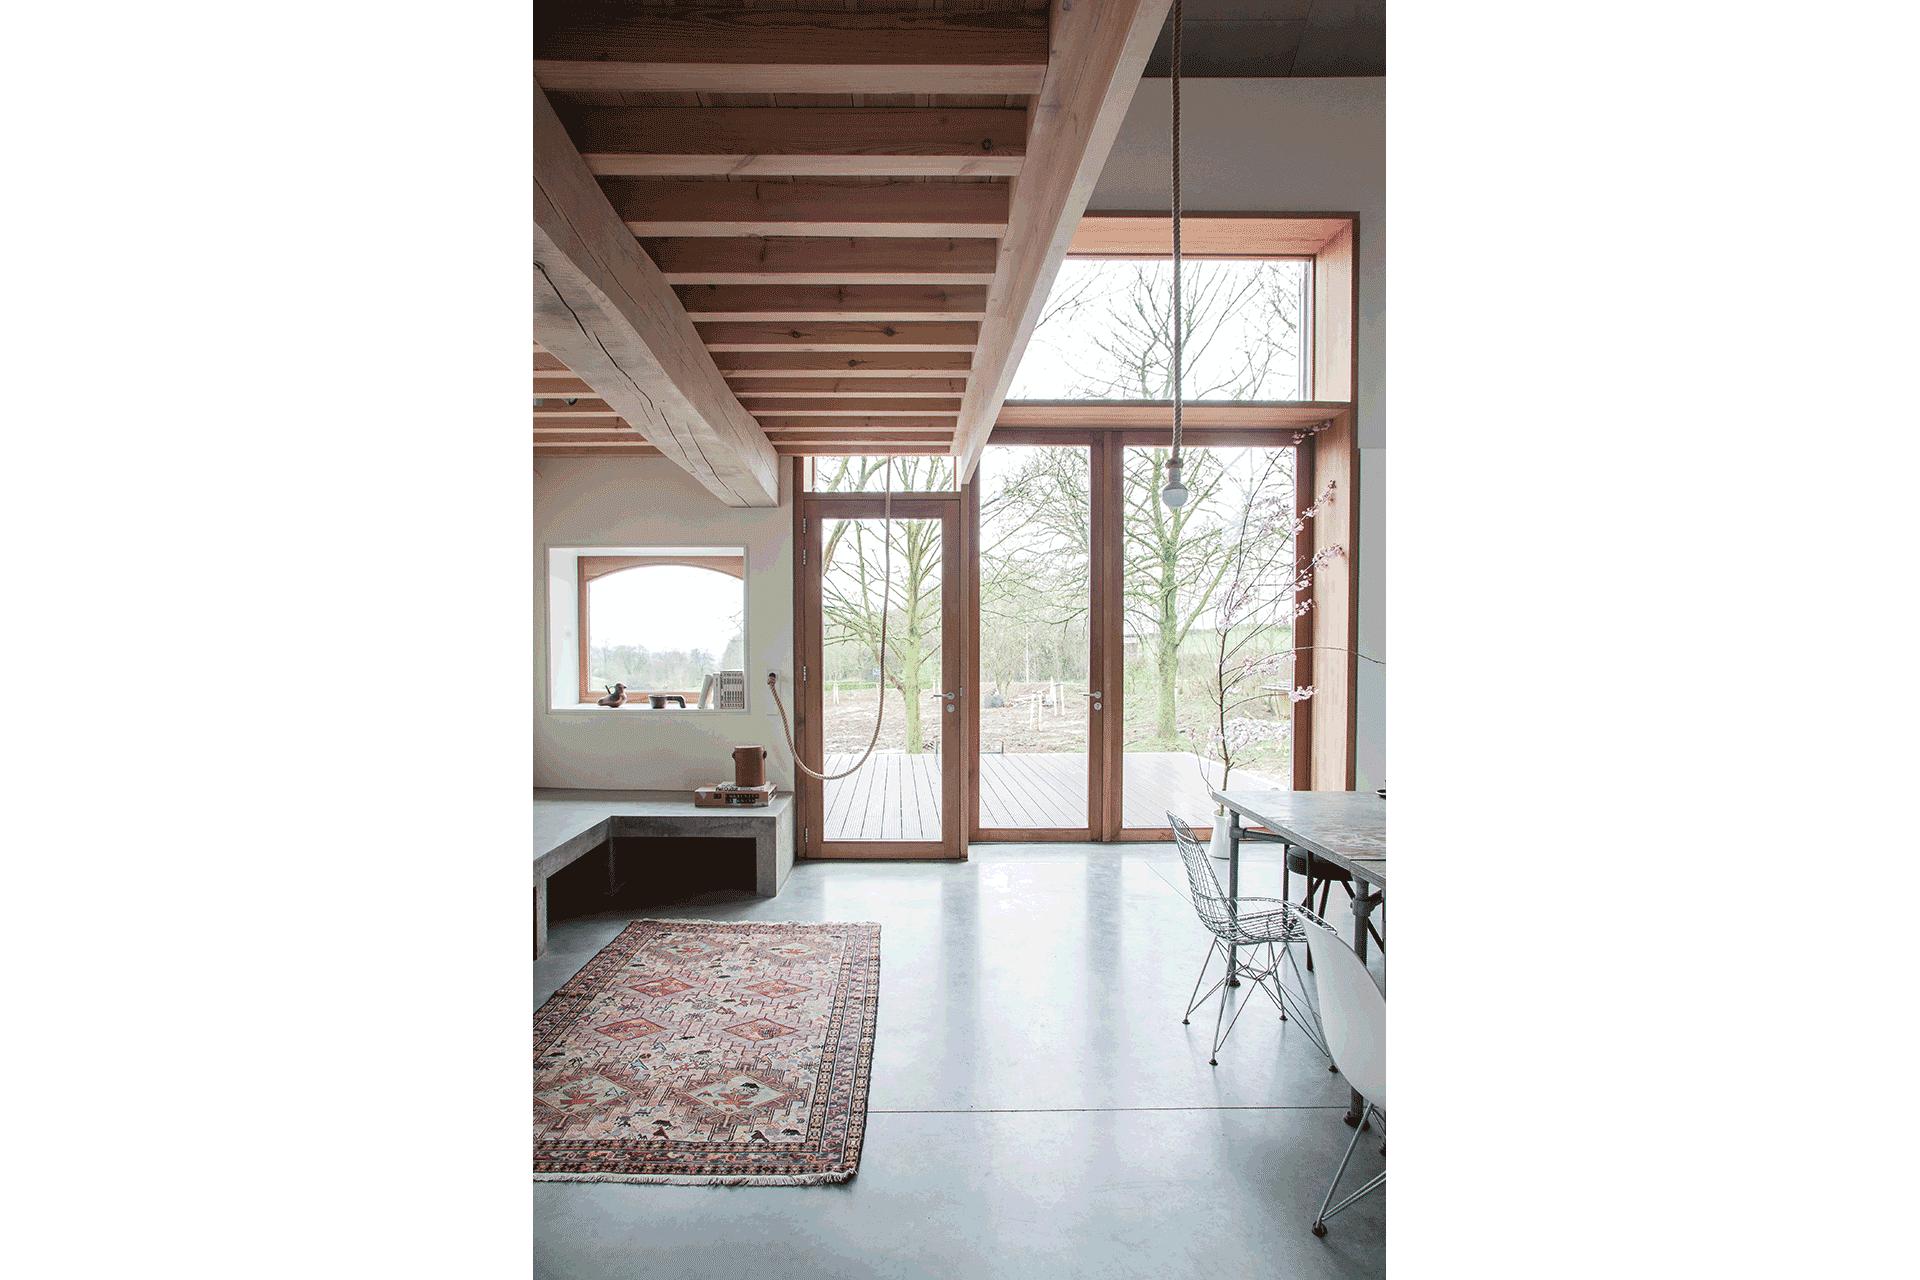 interieur vide plafond hout houtkozijn uitzicht licht woning huis interieur